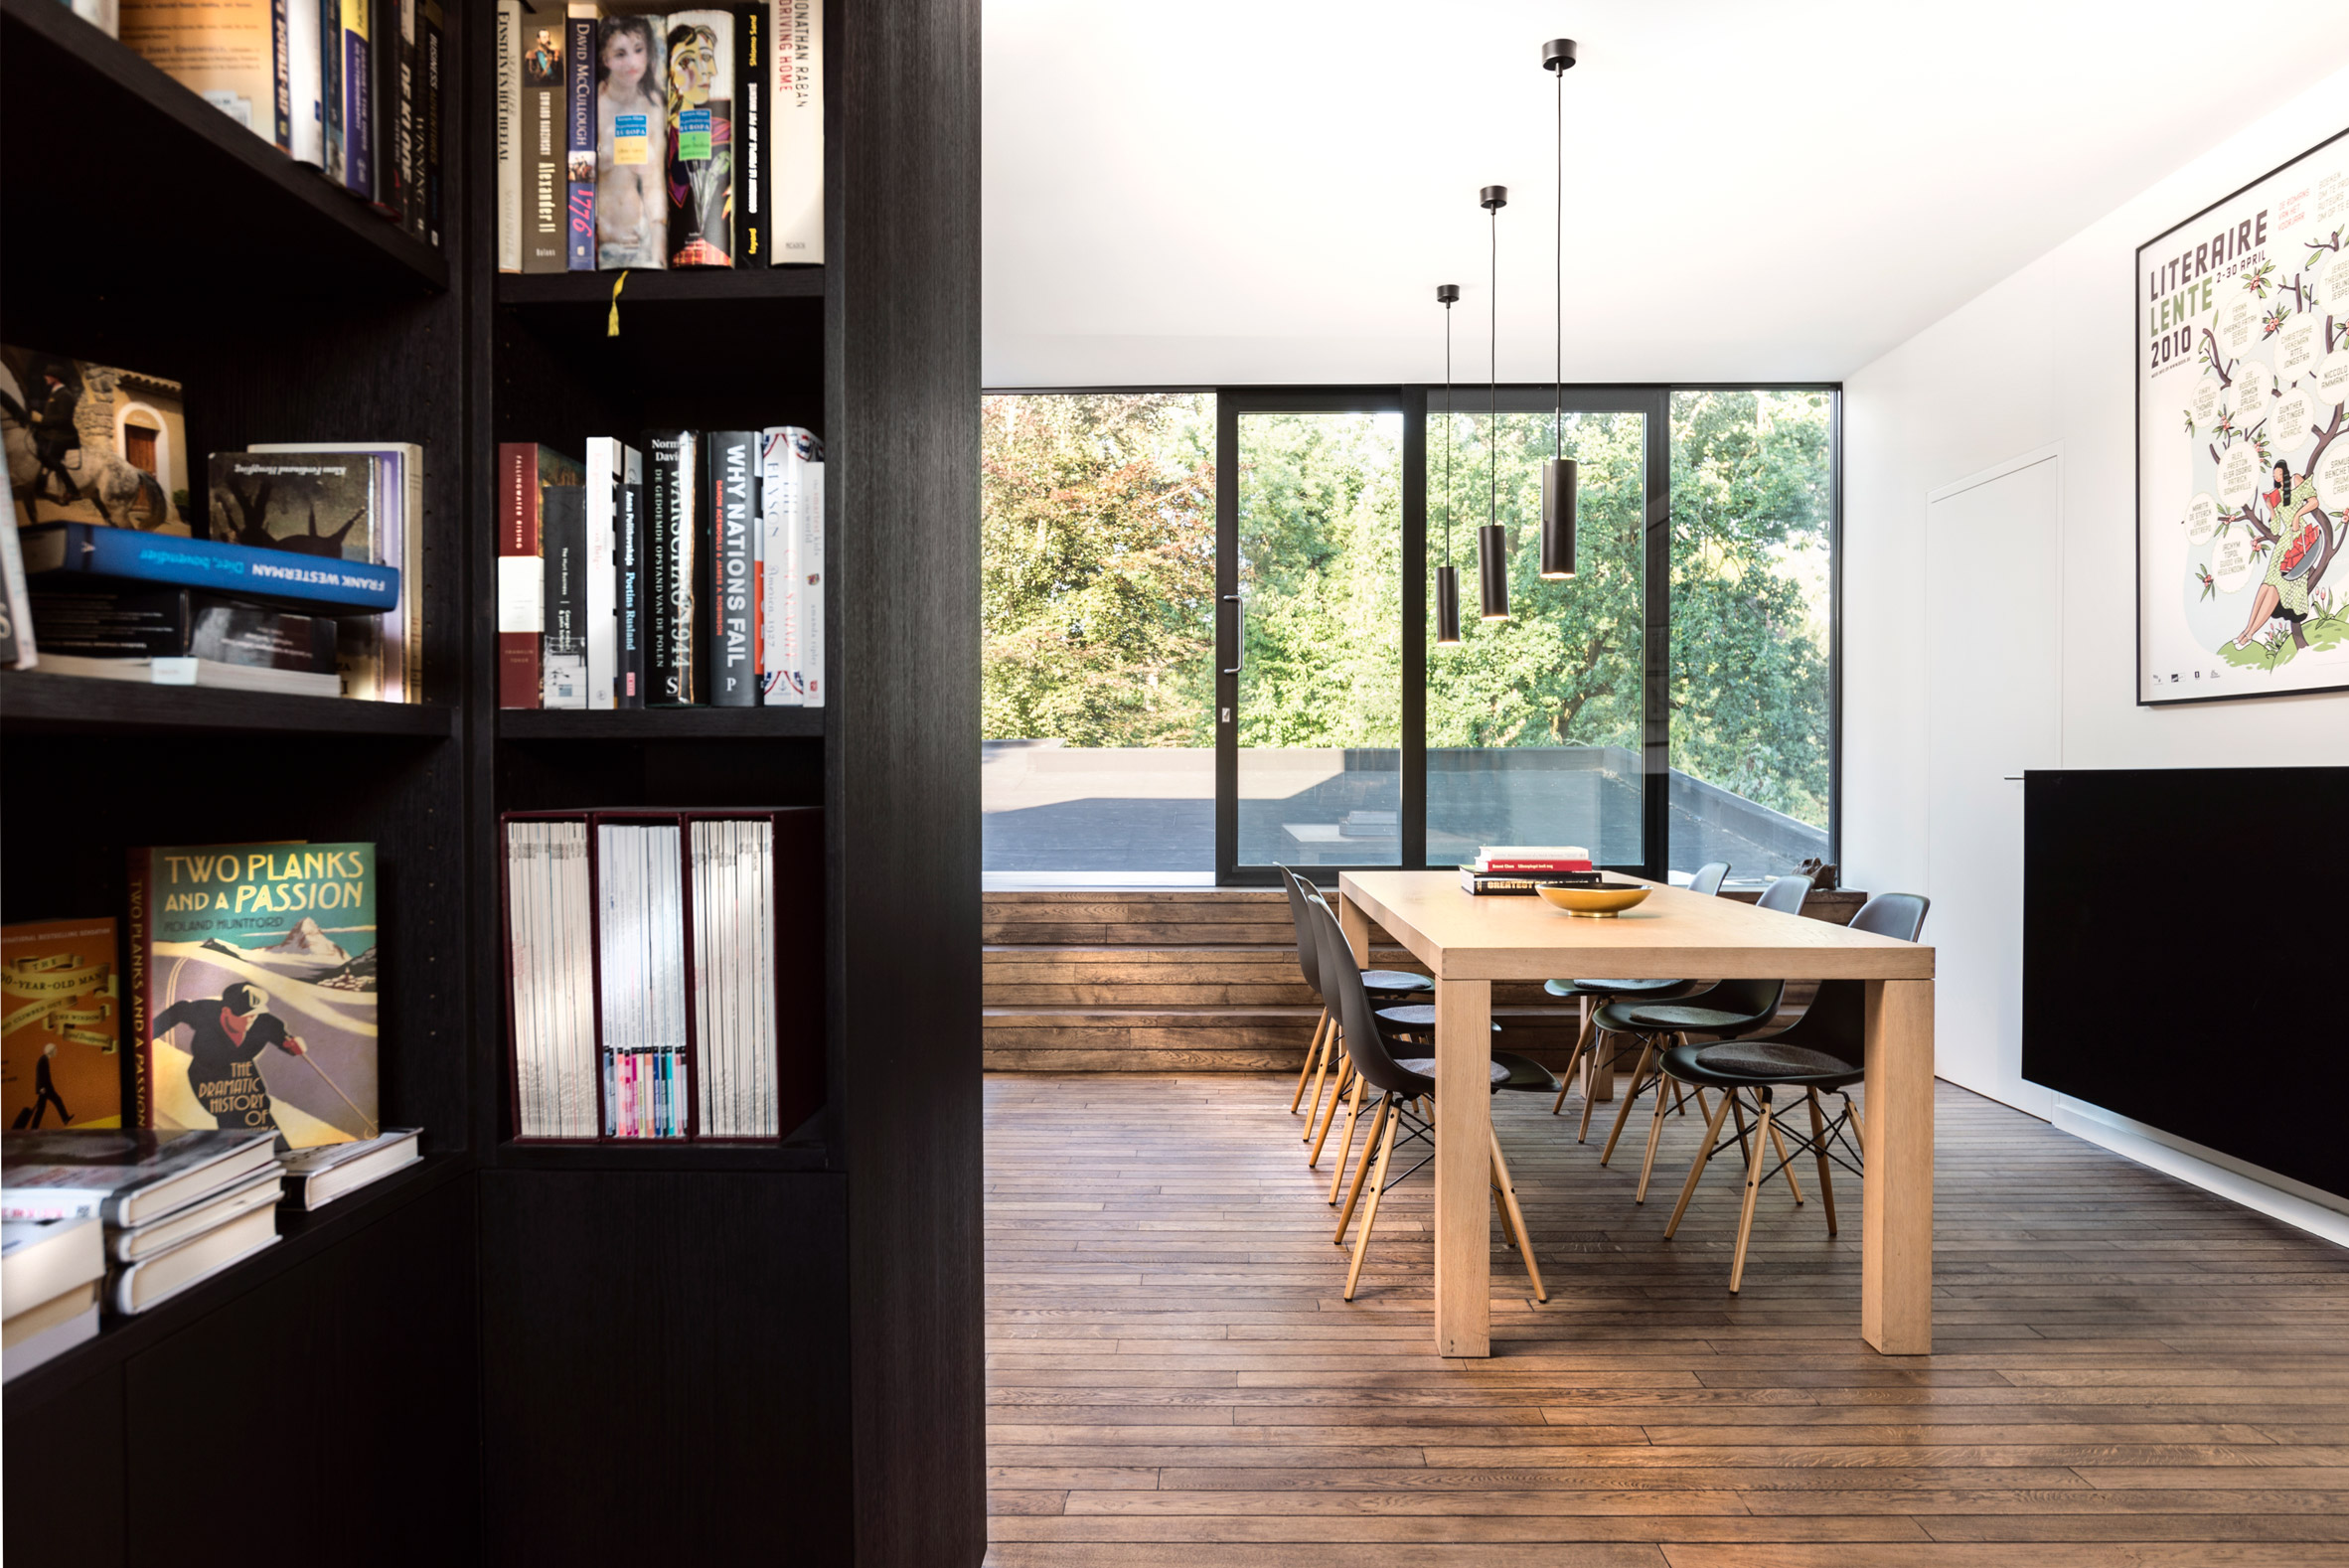 architecture-semi-detached-house-with-an-outdoor-areadesign-studia-interiors-osnovadesign-osnova-poltava_08